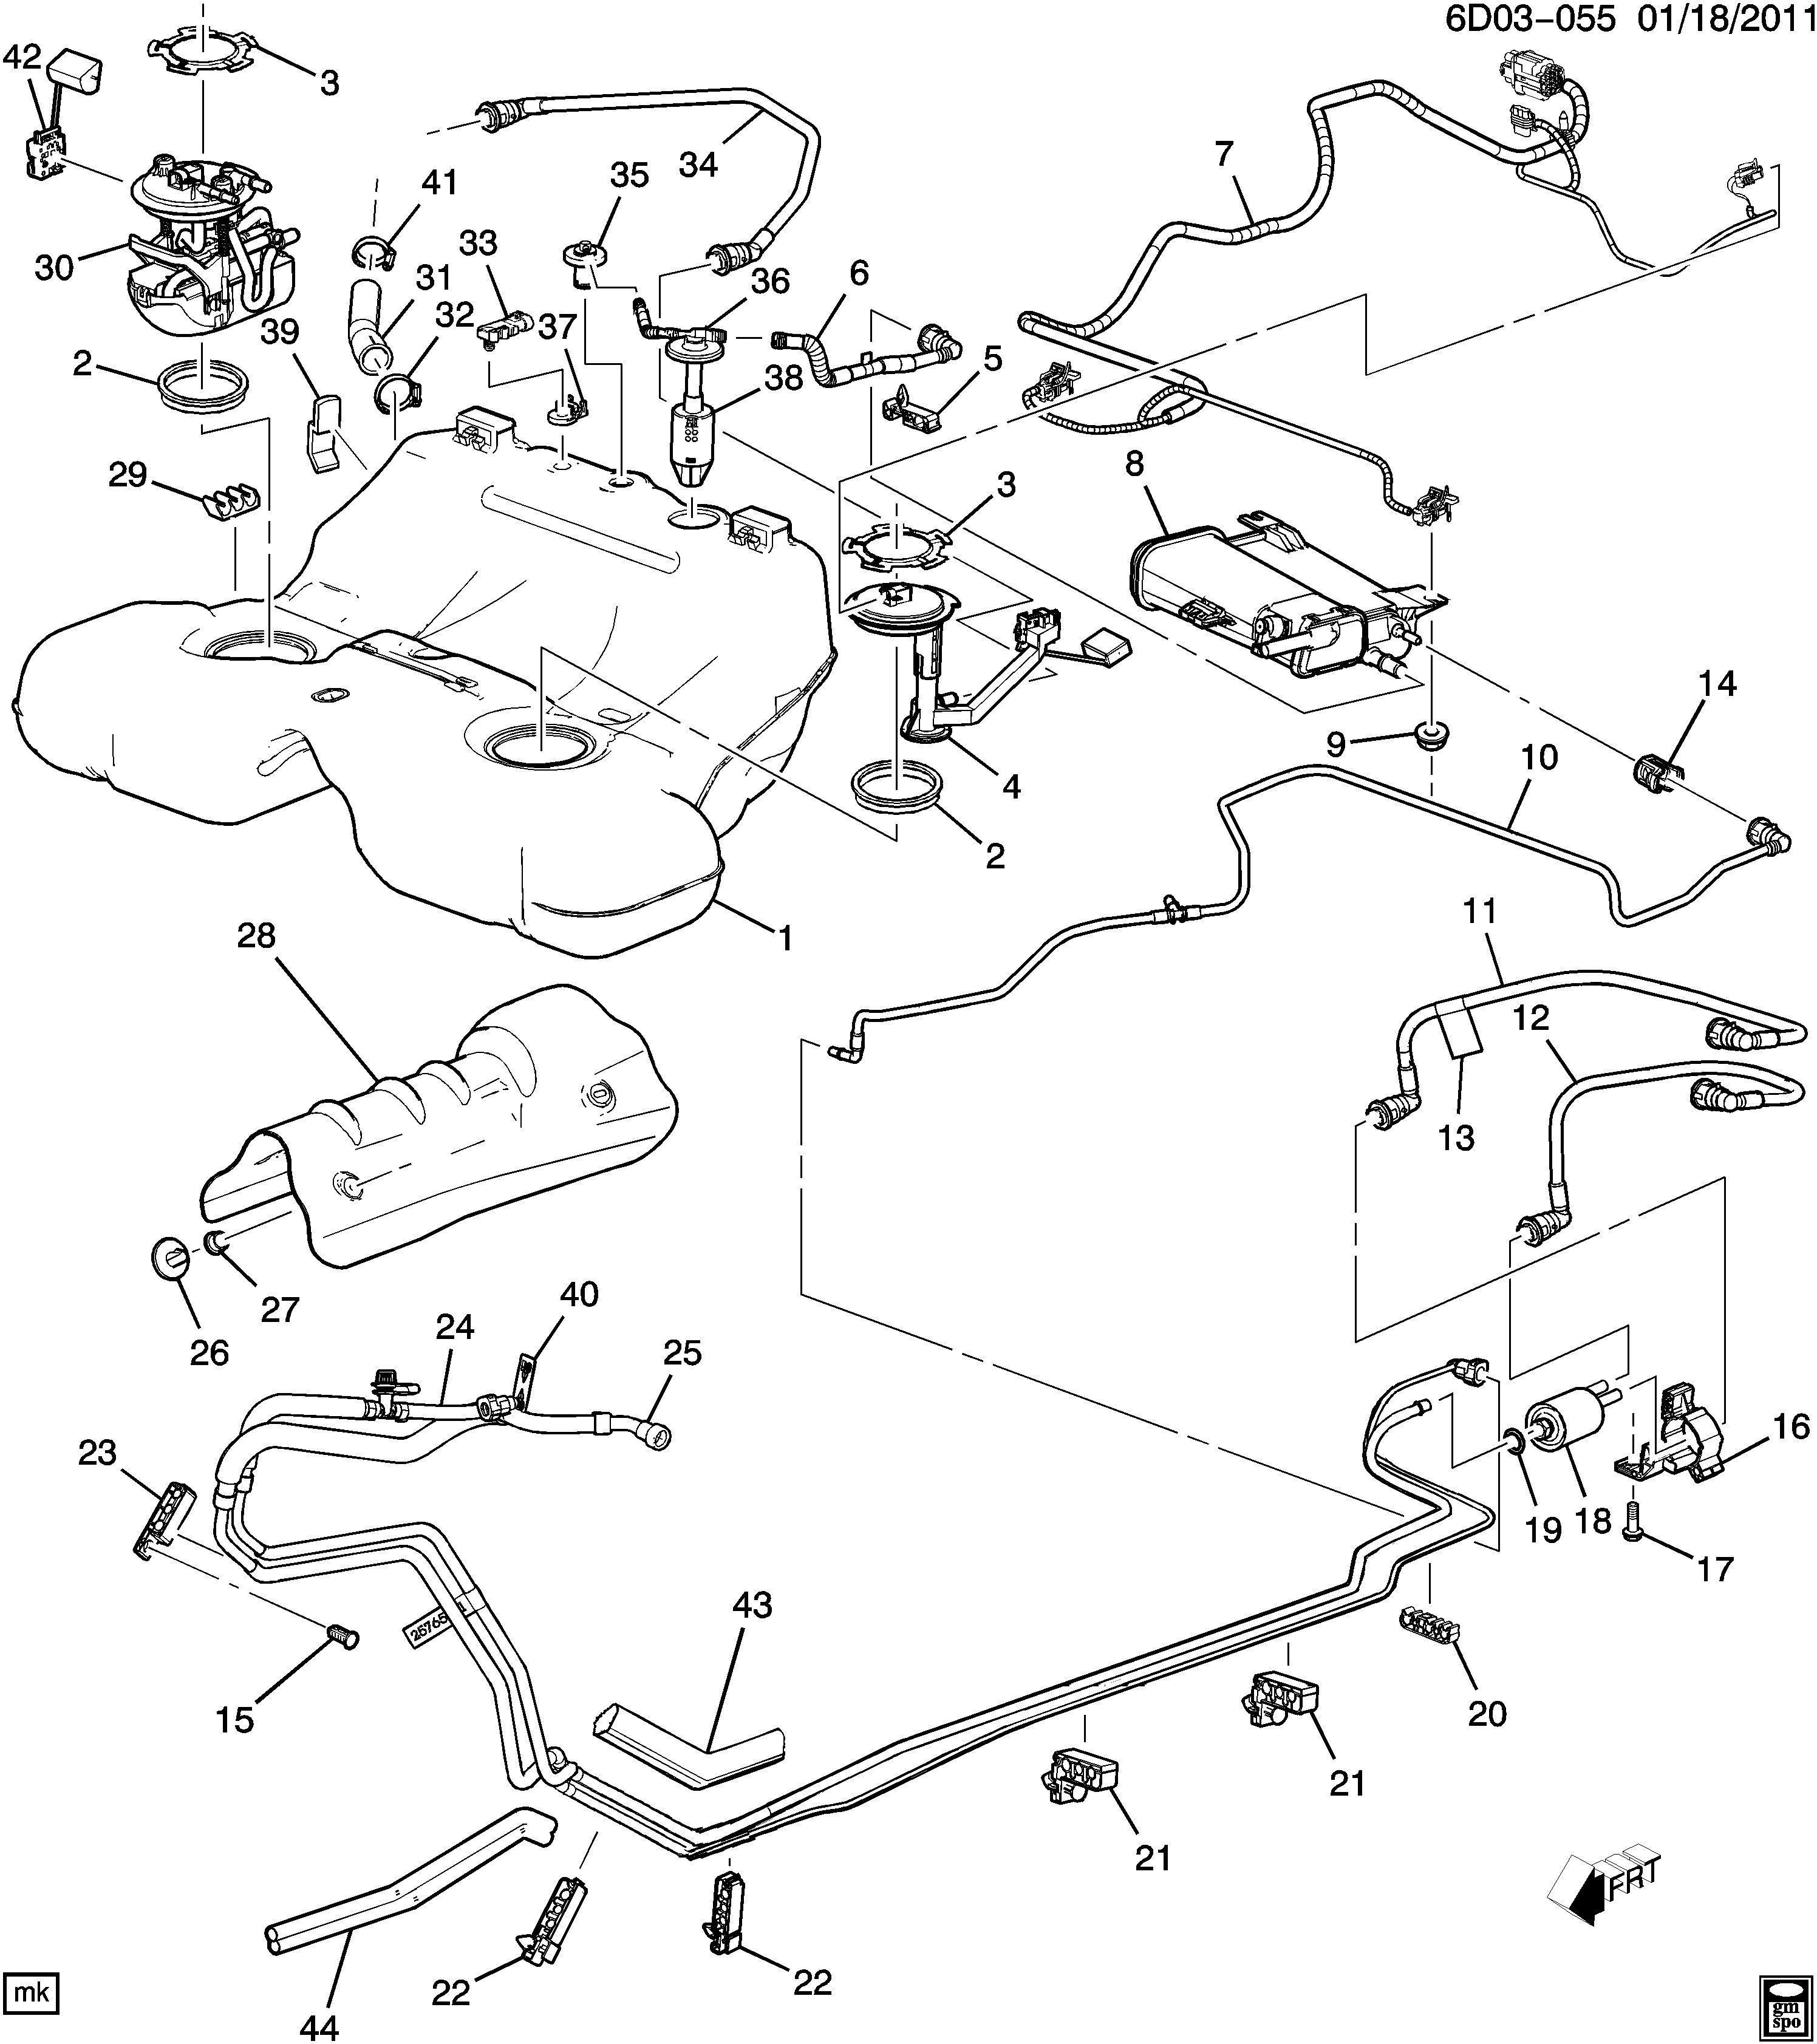 2007 Cadillac CTS Base 4DR Sender kit. Fuel tank meter